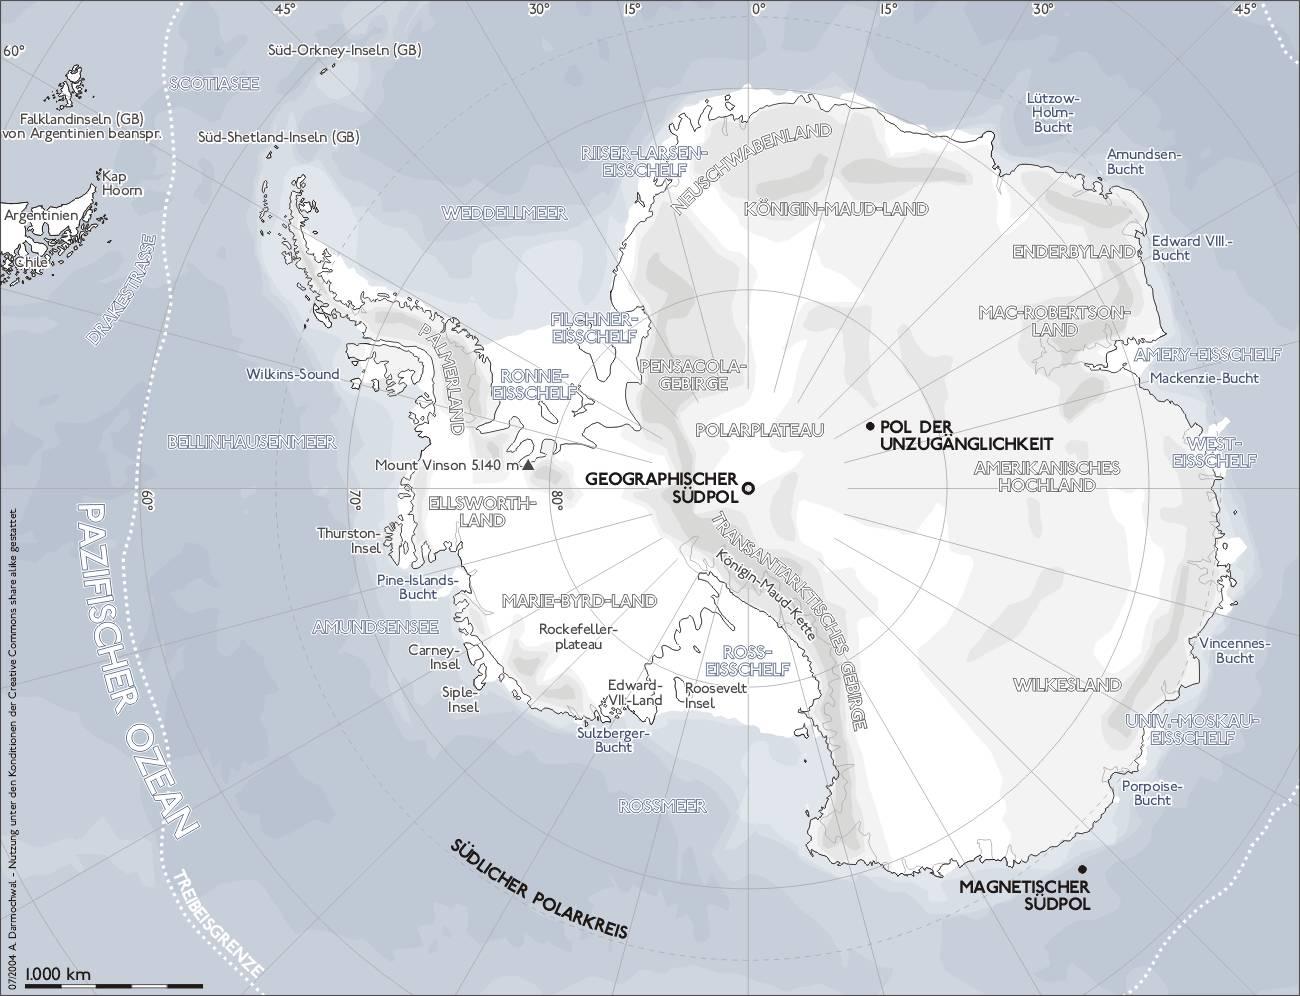 Karte der Antarktis (CC BY-SA 2.0)